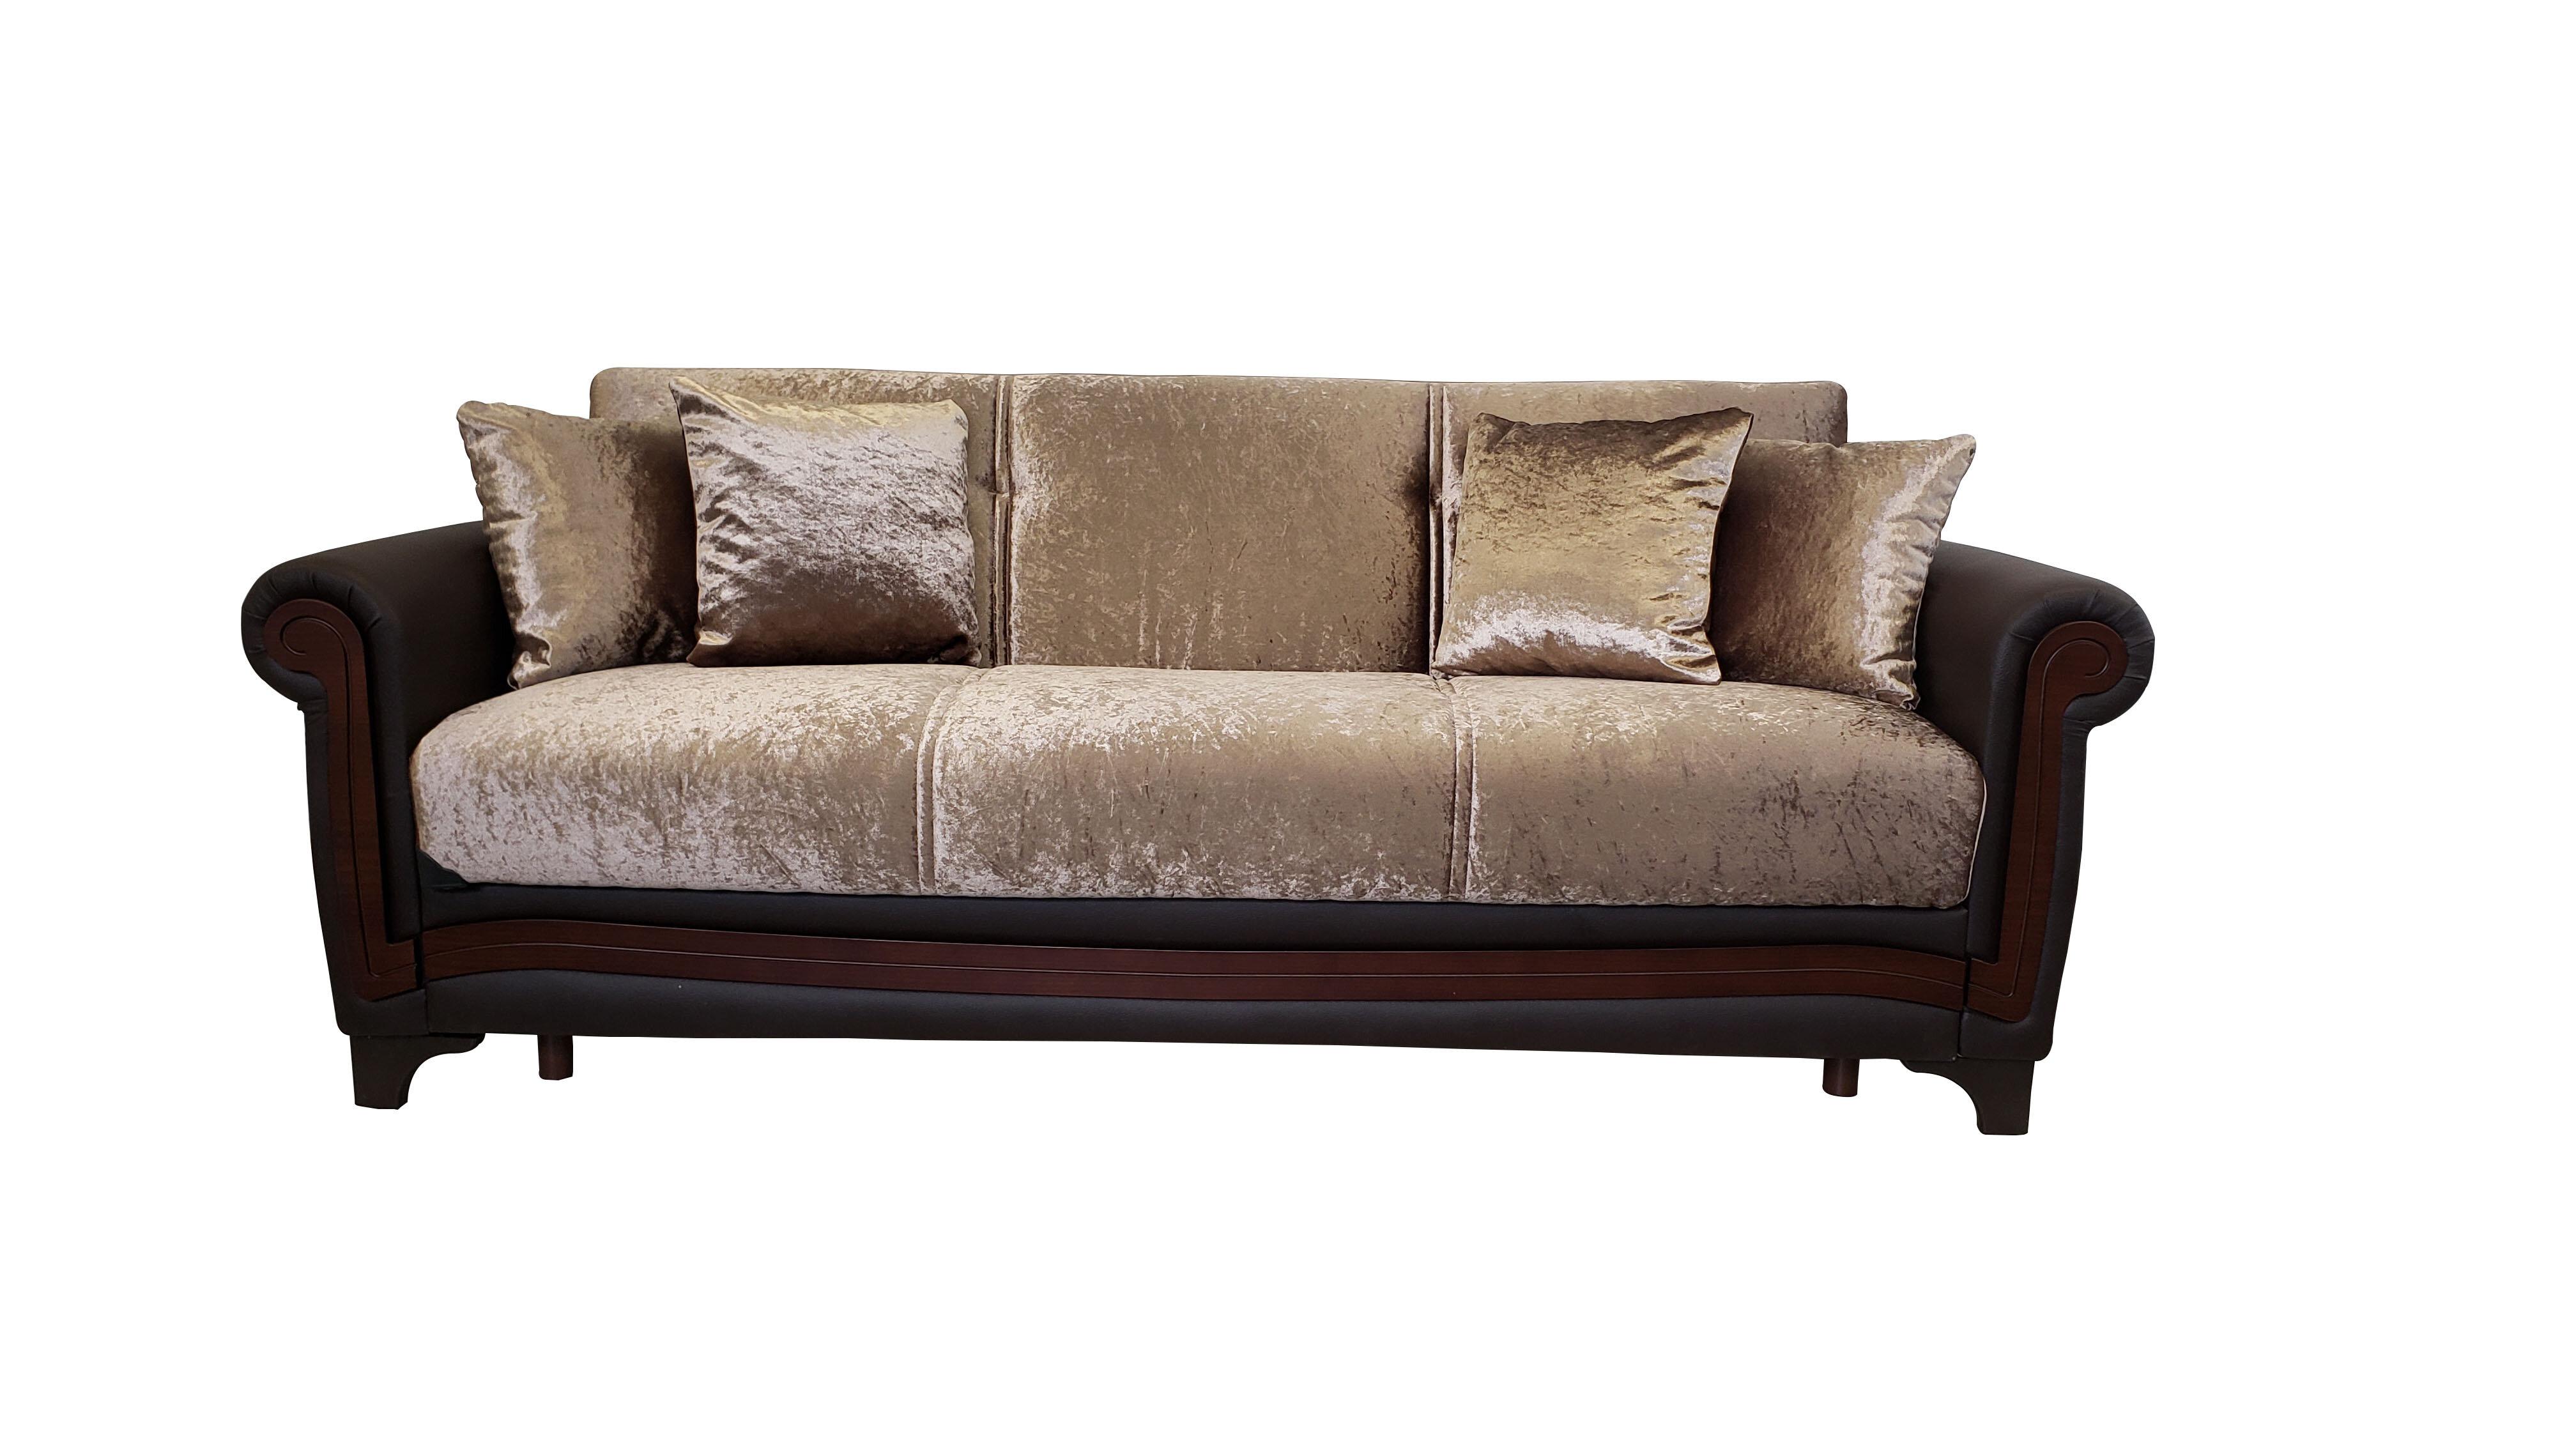 Shah Convertible Sleeper Sofa